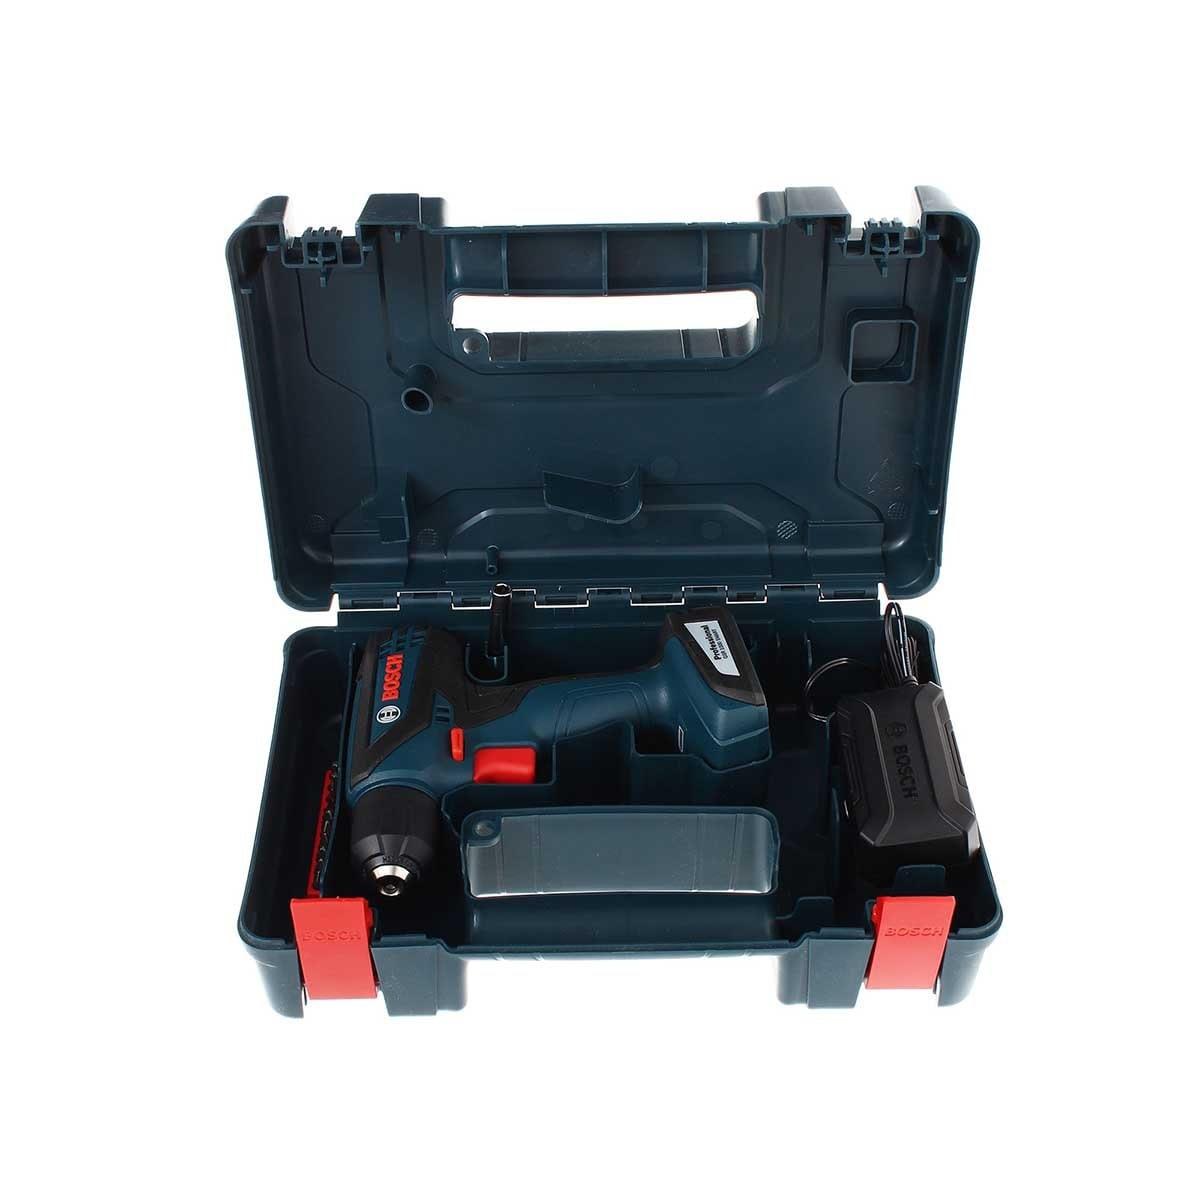 Taladro/atornillador 12 Volts Max Batería Li-Ion 0 Bosch